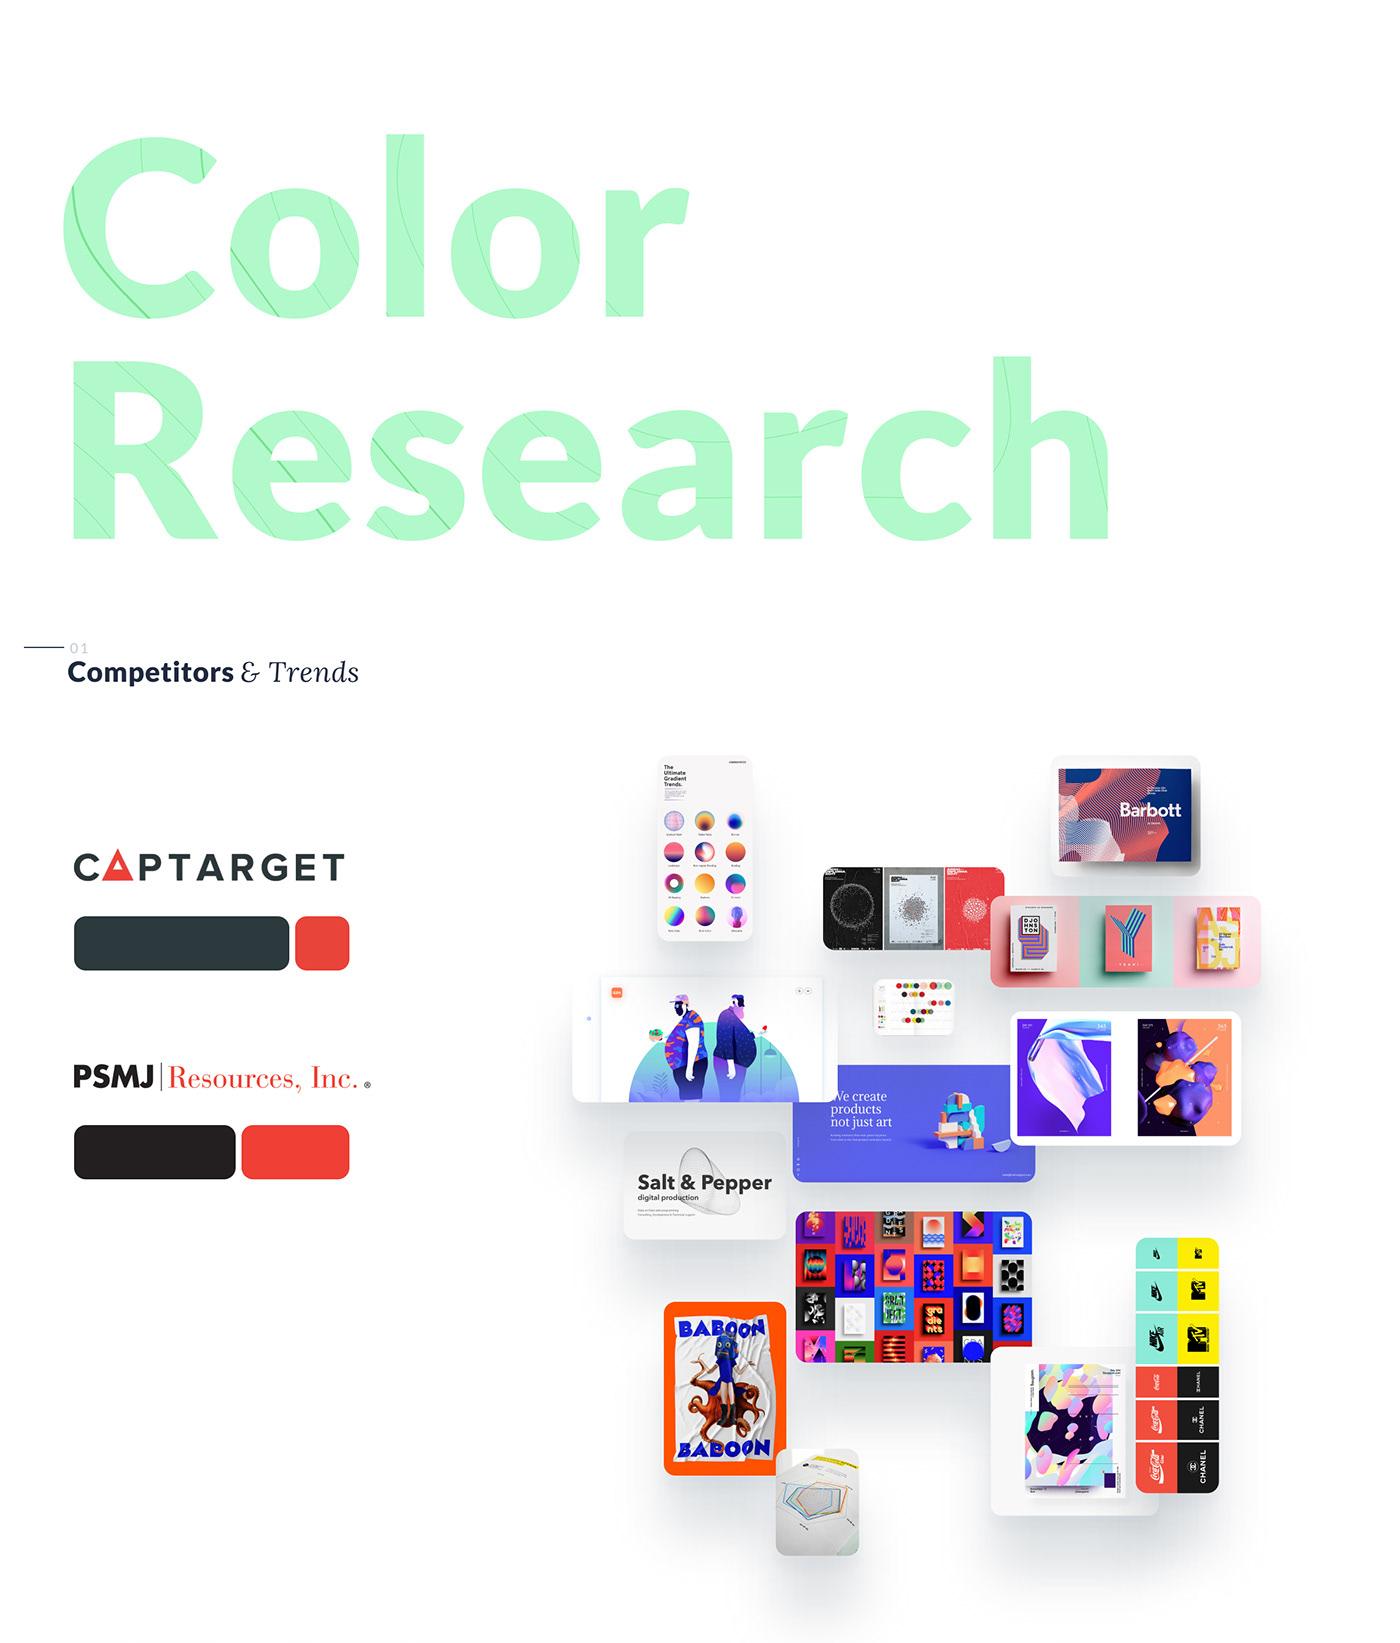 Adobe Photoshop adobe illustrator visual kit mockups graphic design  yaka design bureau identity branding  aiga research